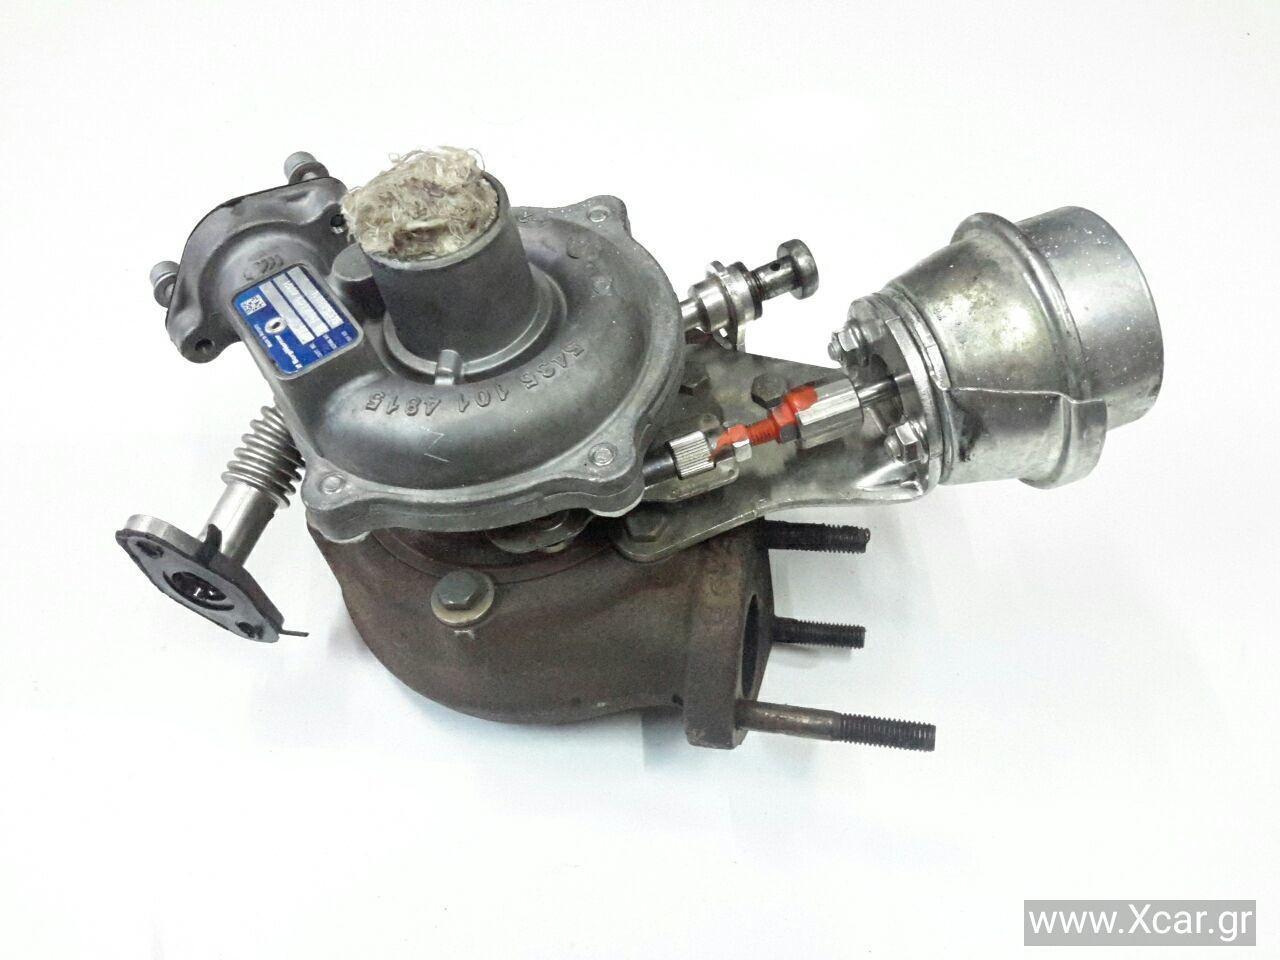 Turbo-Τουρμπίνα FIAT GRANDE PUNTO Hatchback / 3dr 2005 - 2008 ( 199  } 1300 ( 199A3.000  } Diesel 90 Multijet #54359880014